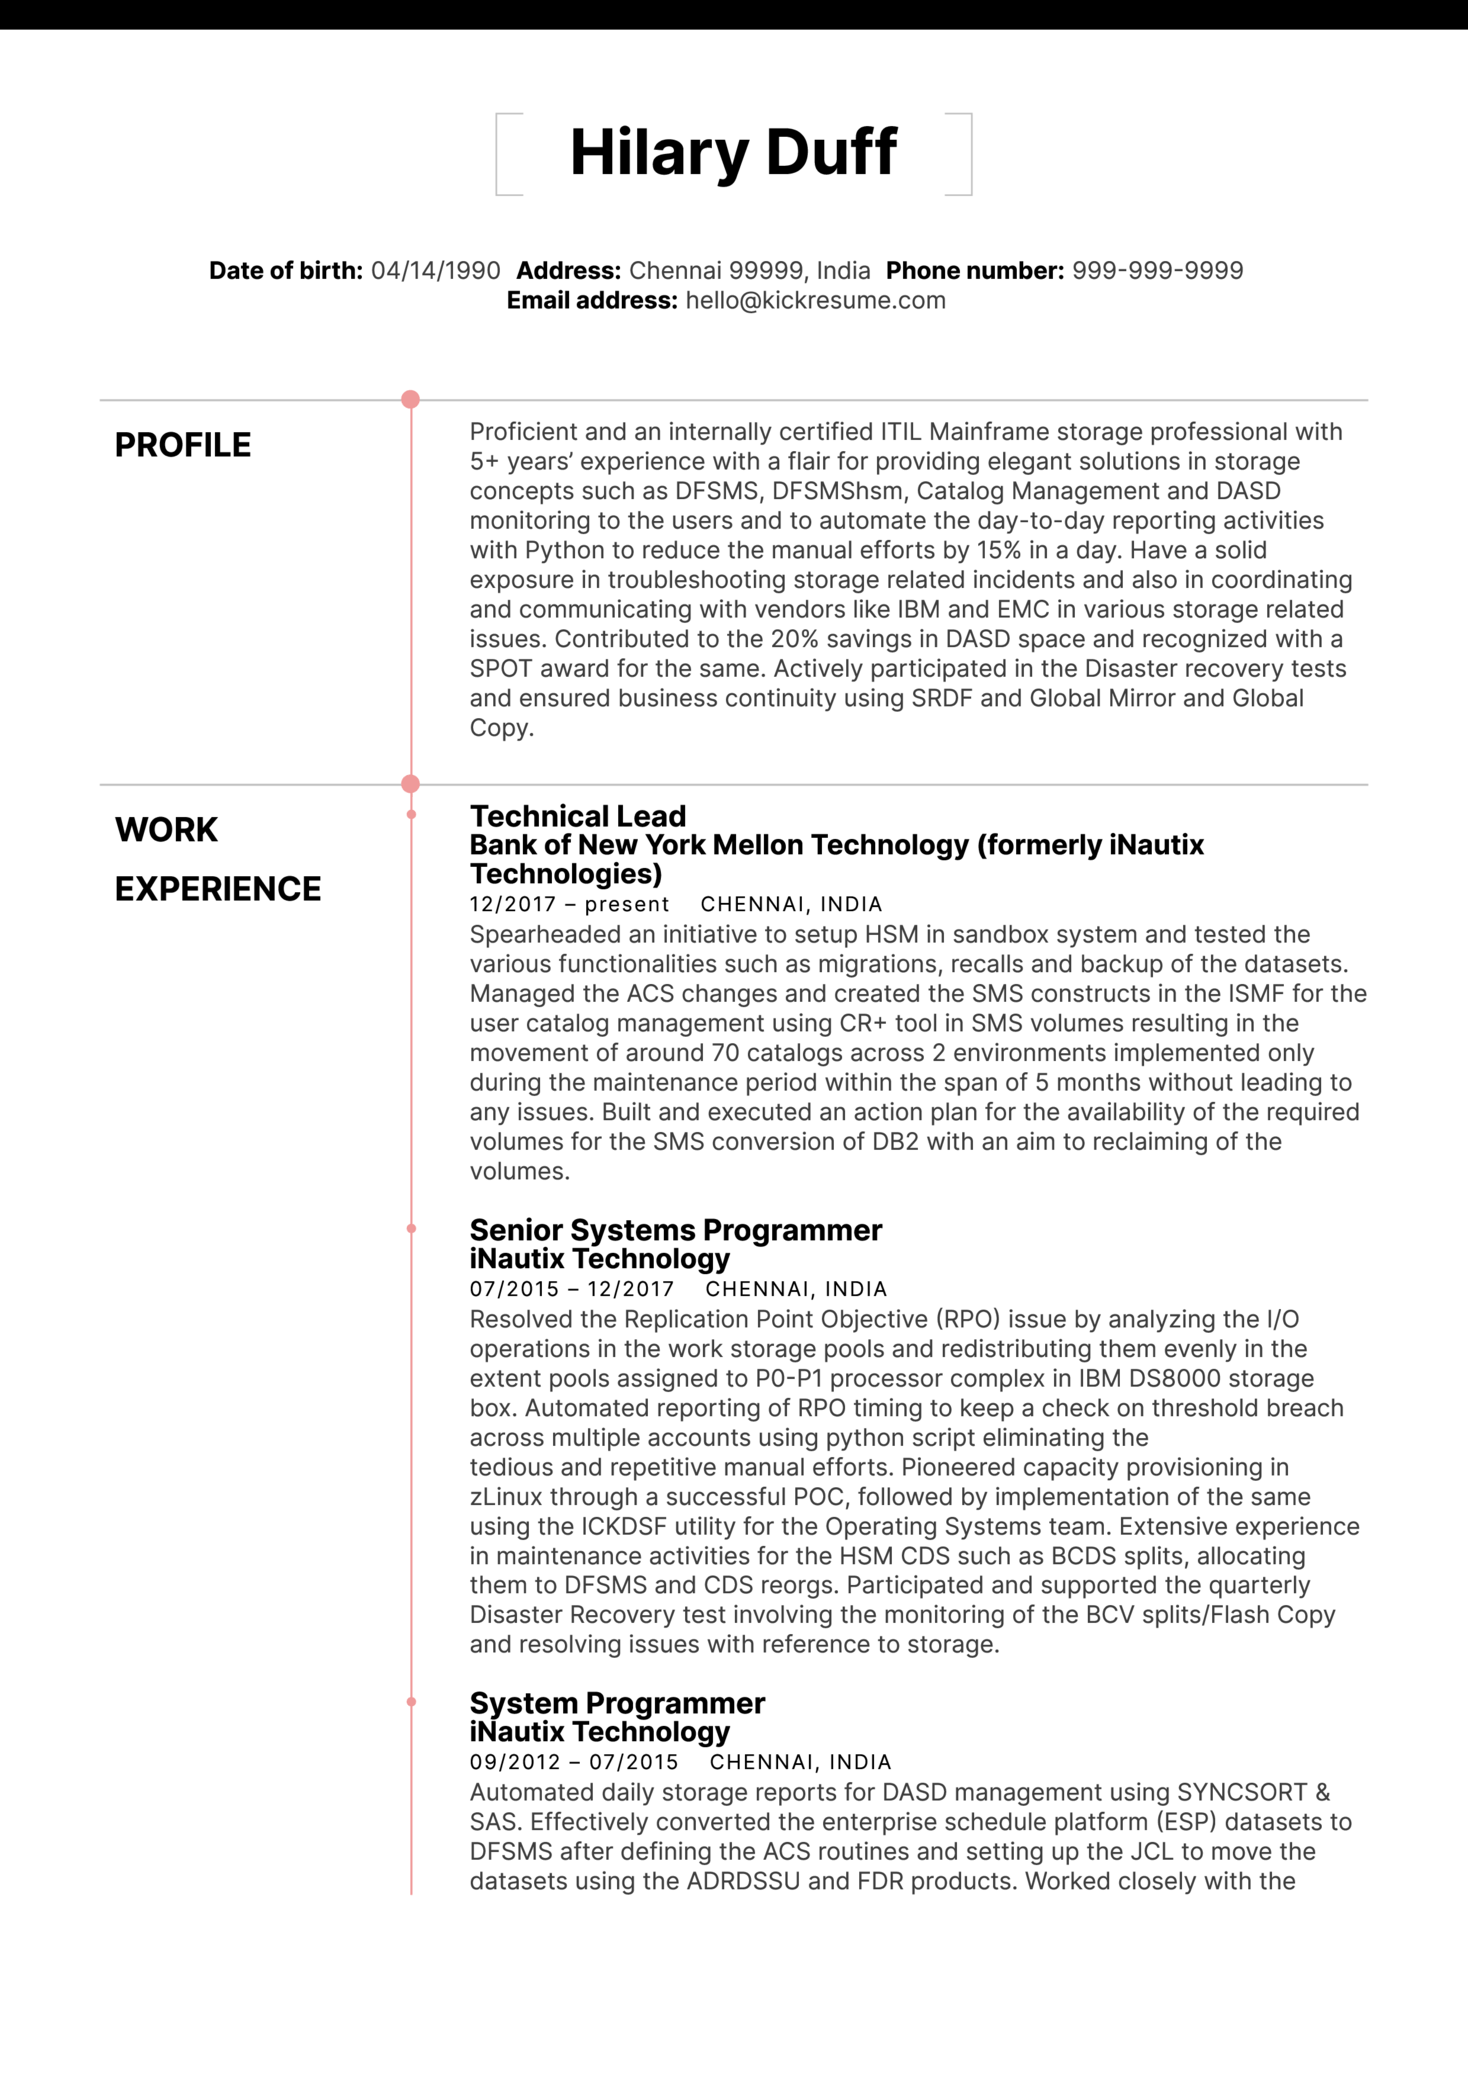 Merck Technical Lead Resume Sample (parte 1)